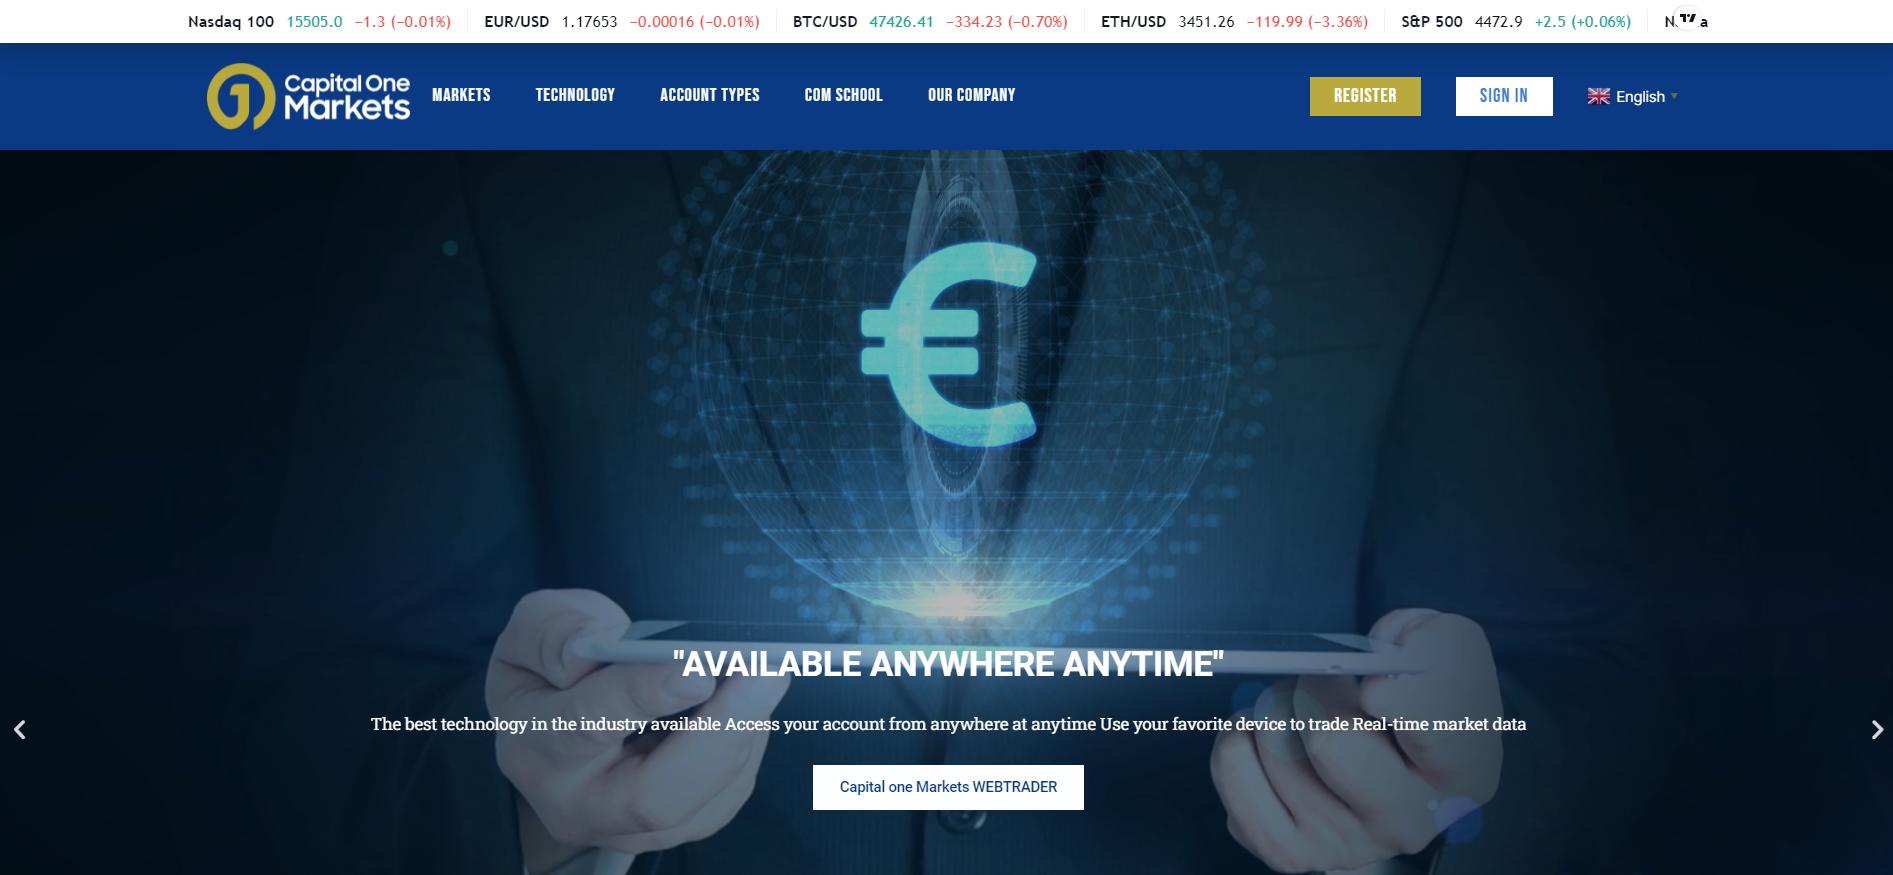 capital one markets сайт компании